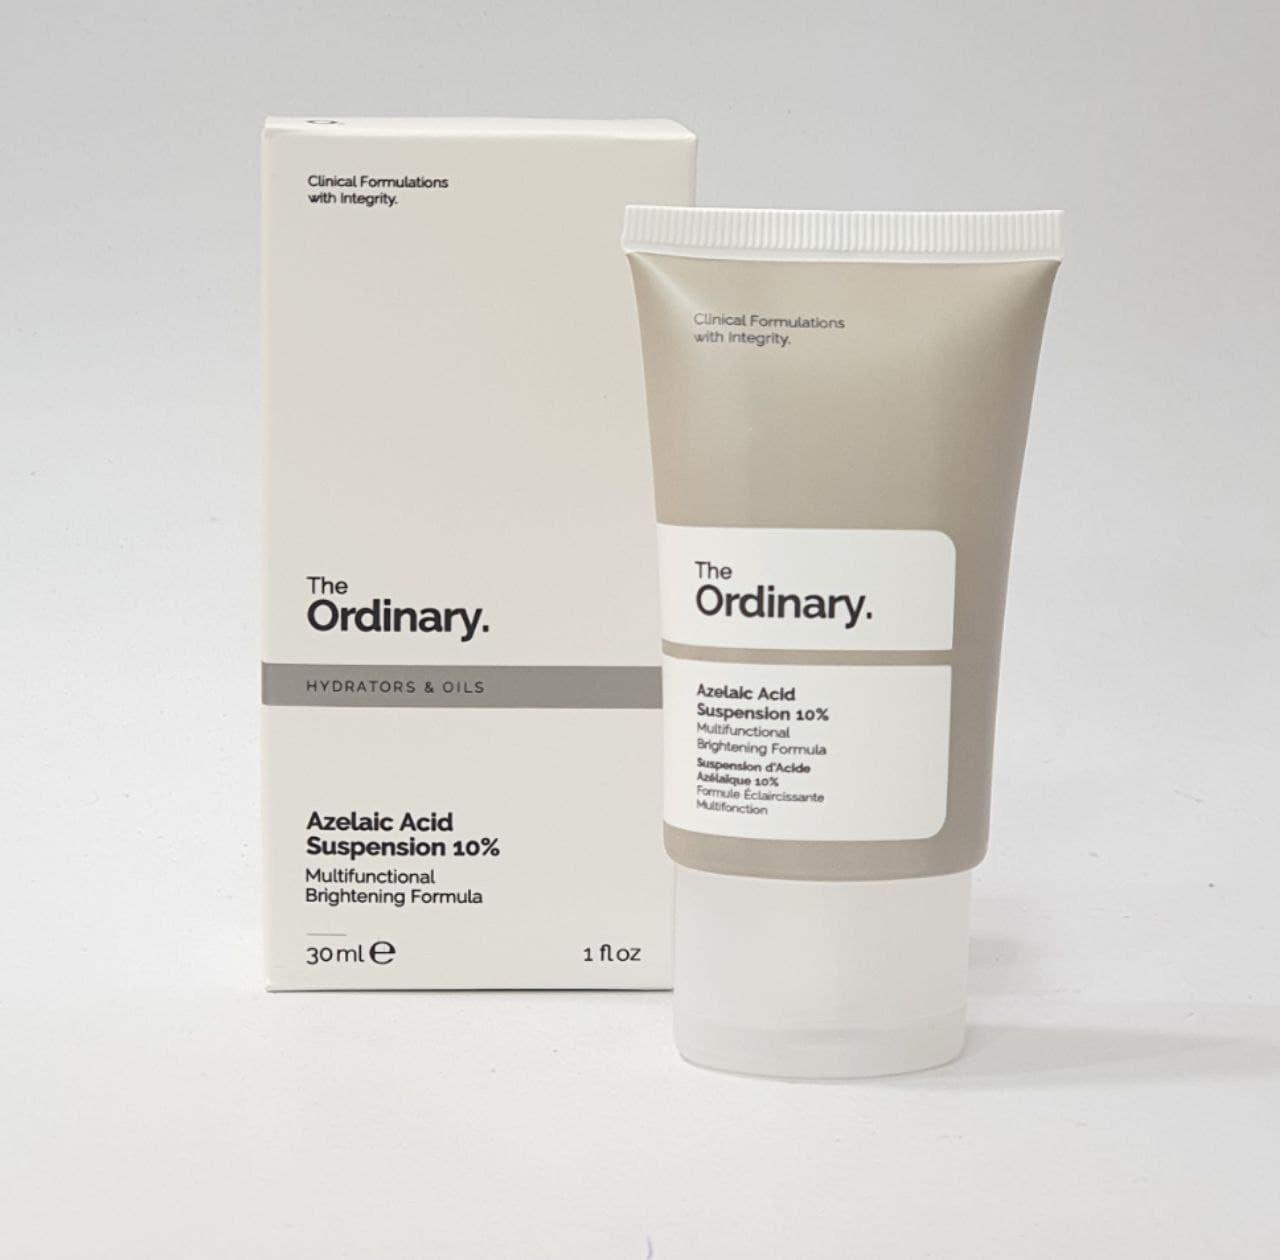 تصویر کرم آزلائیک اسید ۱۰%، آنتی اکسیدان و ضد جوش اوردینری The Ordinary